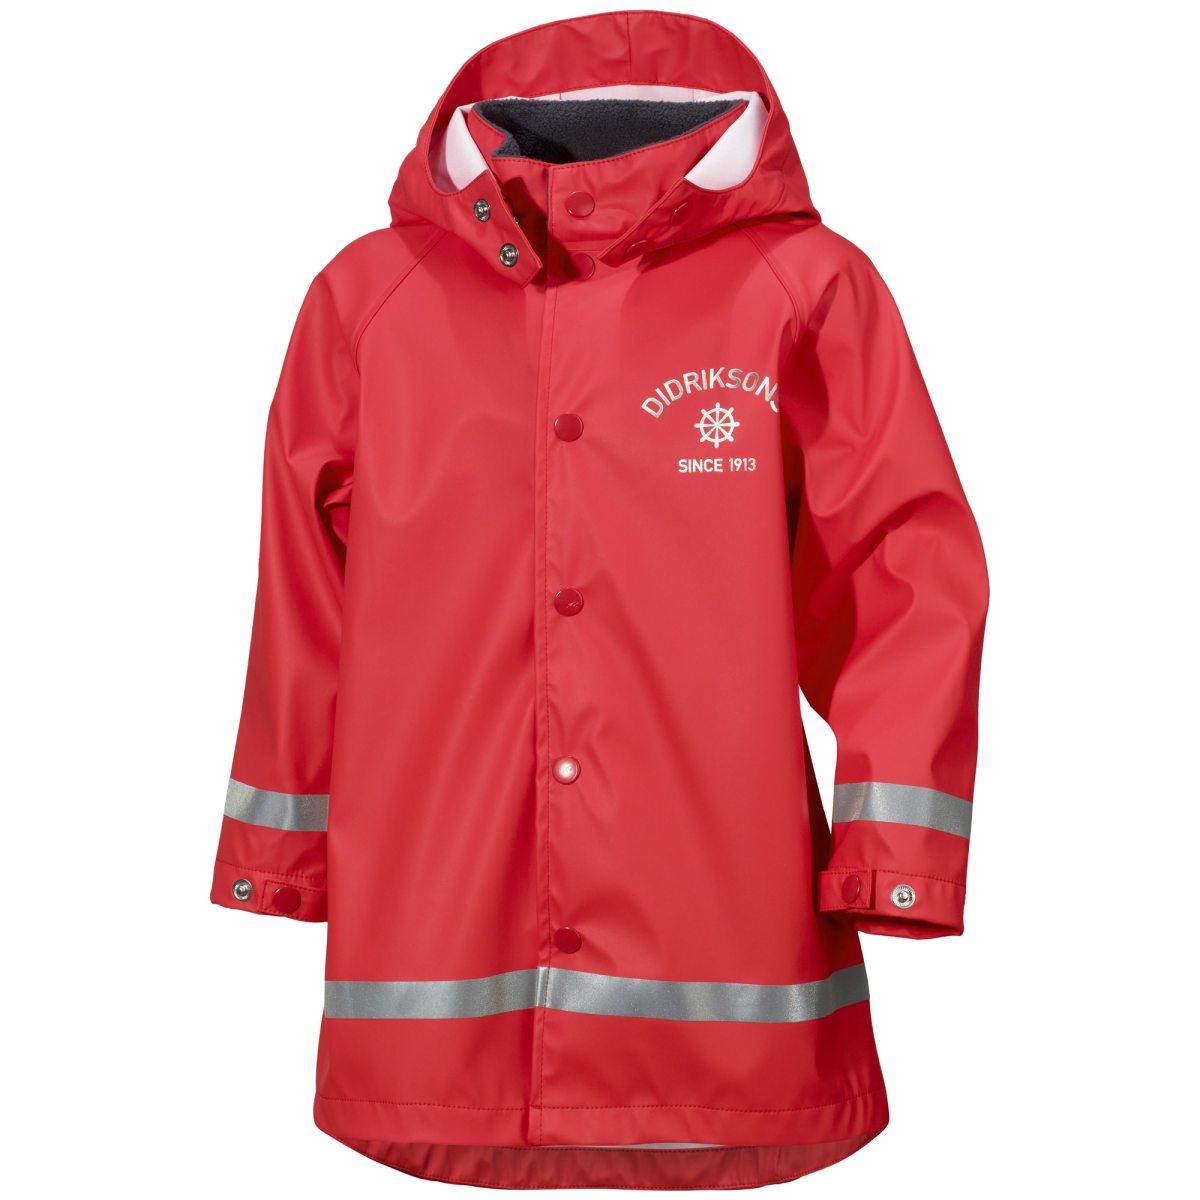 bbaa20b6 Find didriksons puffy jakke rød. Shop every store on the internet ...